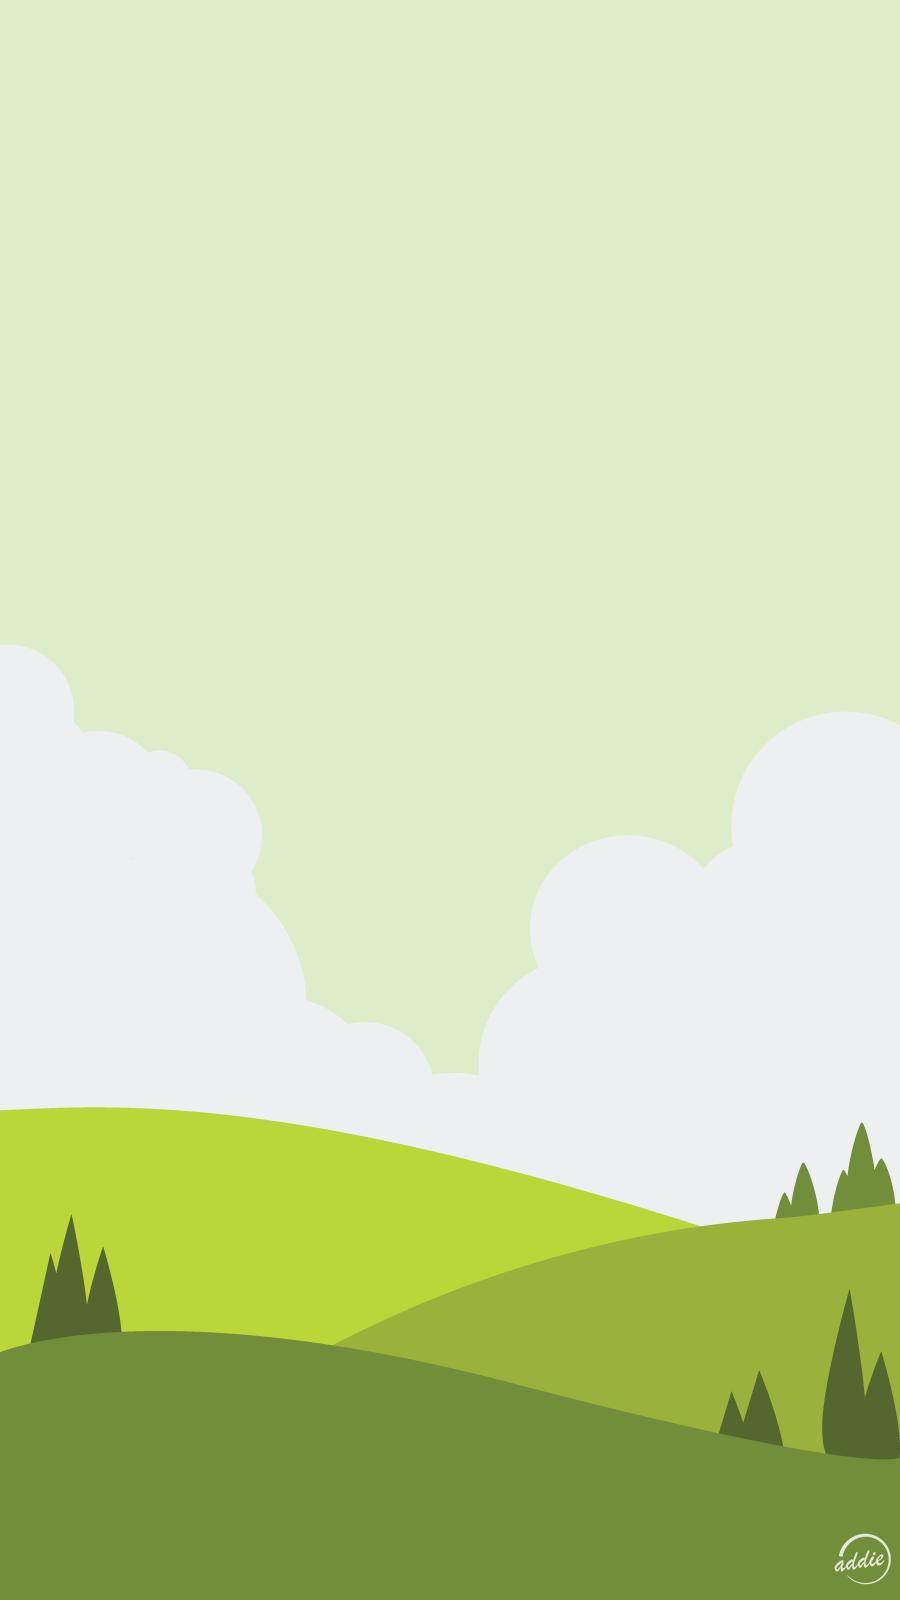 Minimal Country Vector Phone Wallpaper